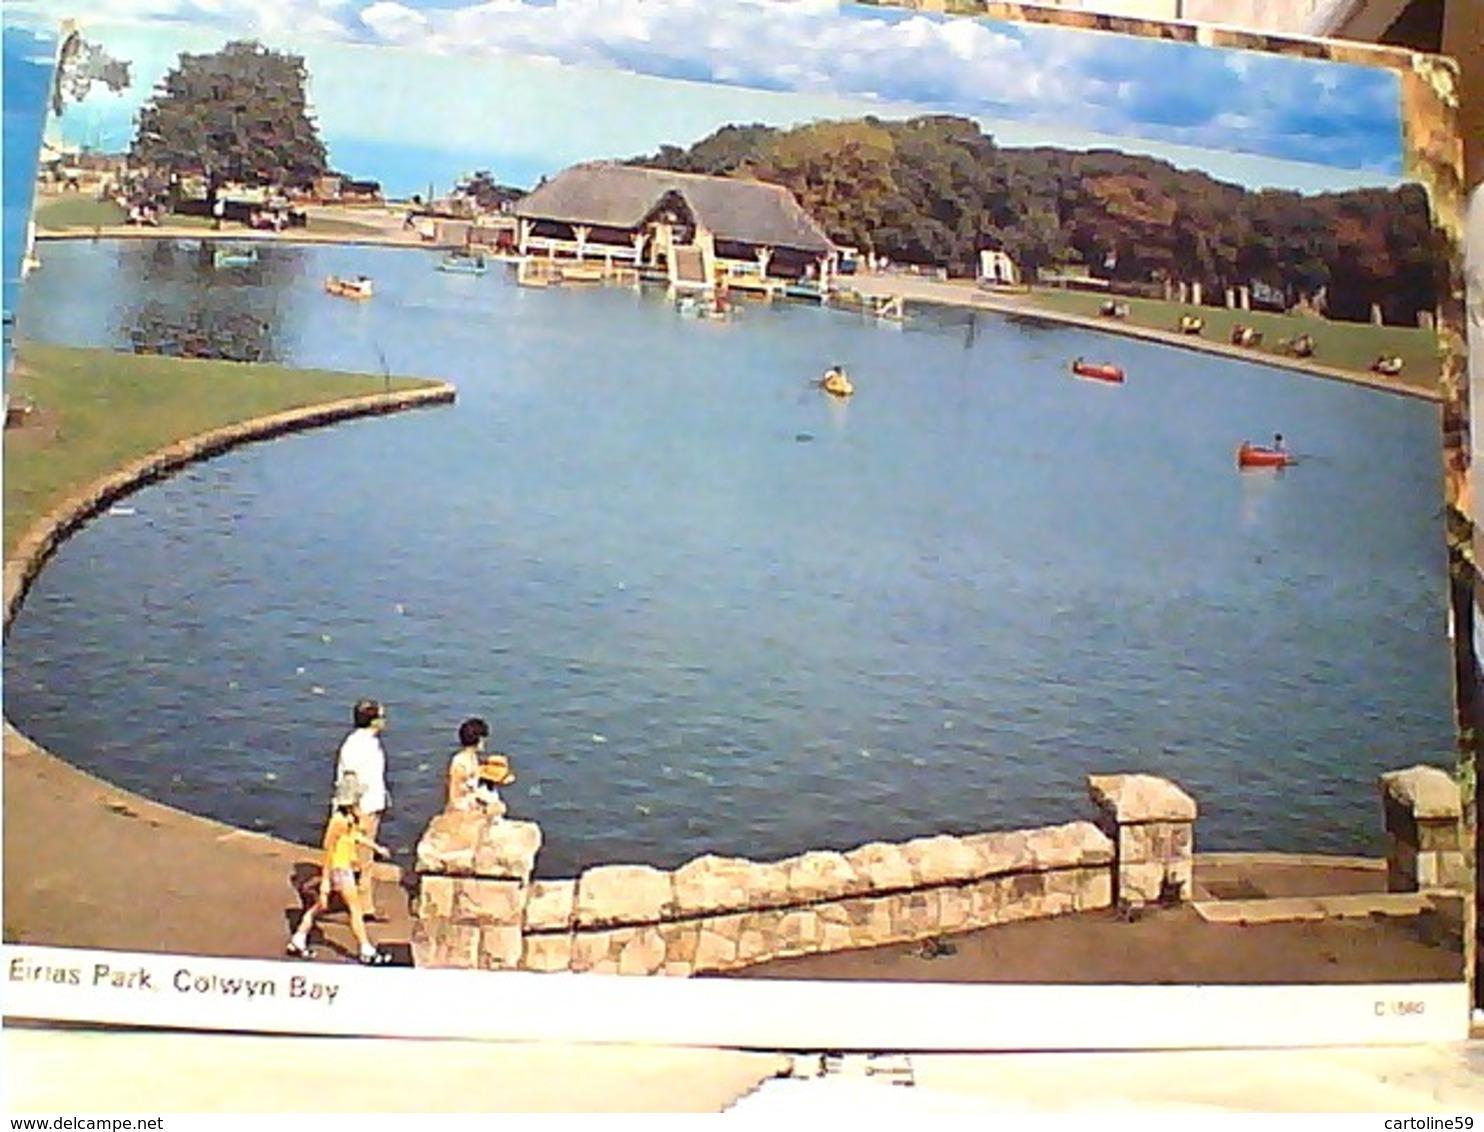 Wales - Eirias Park, Colwyn Bay  STAMP TIMBRE  SELO 18 P DERWENTWATER ENGLAND  GX5627 - Denbighshire